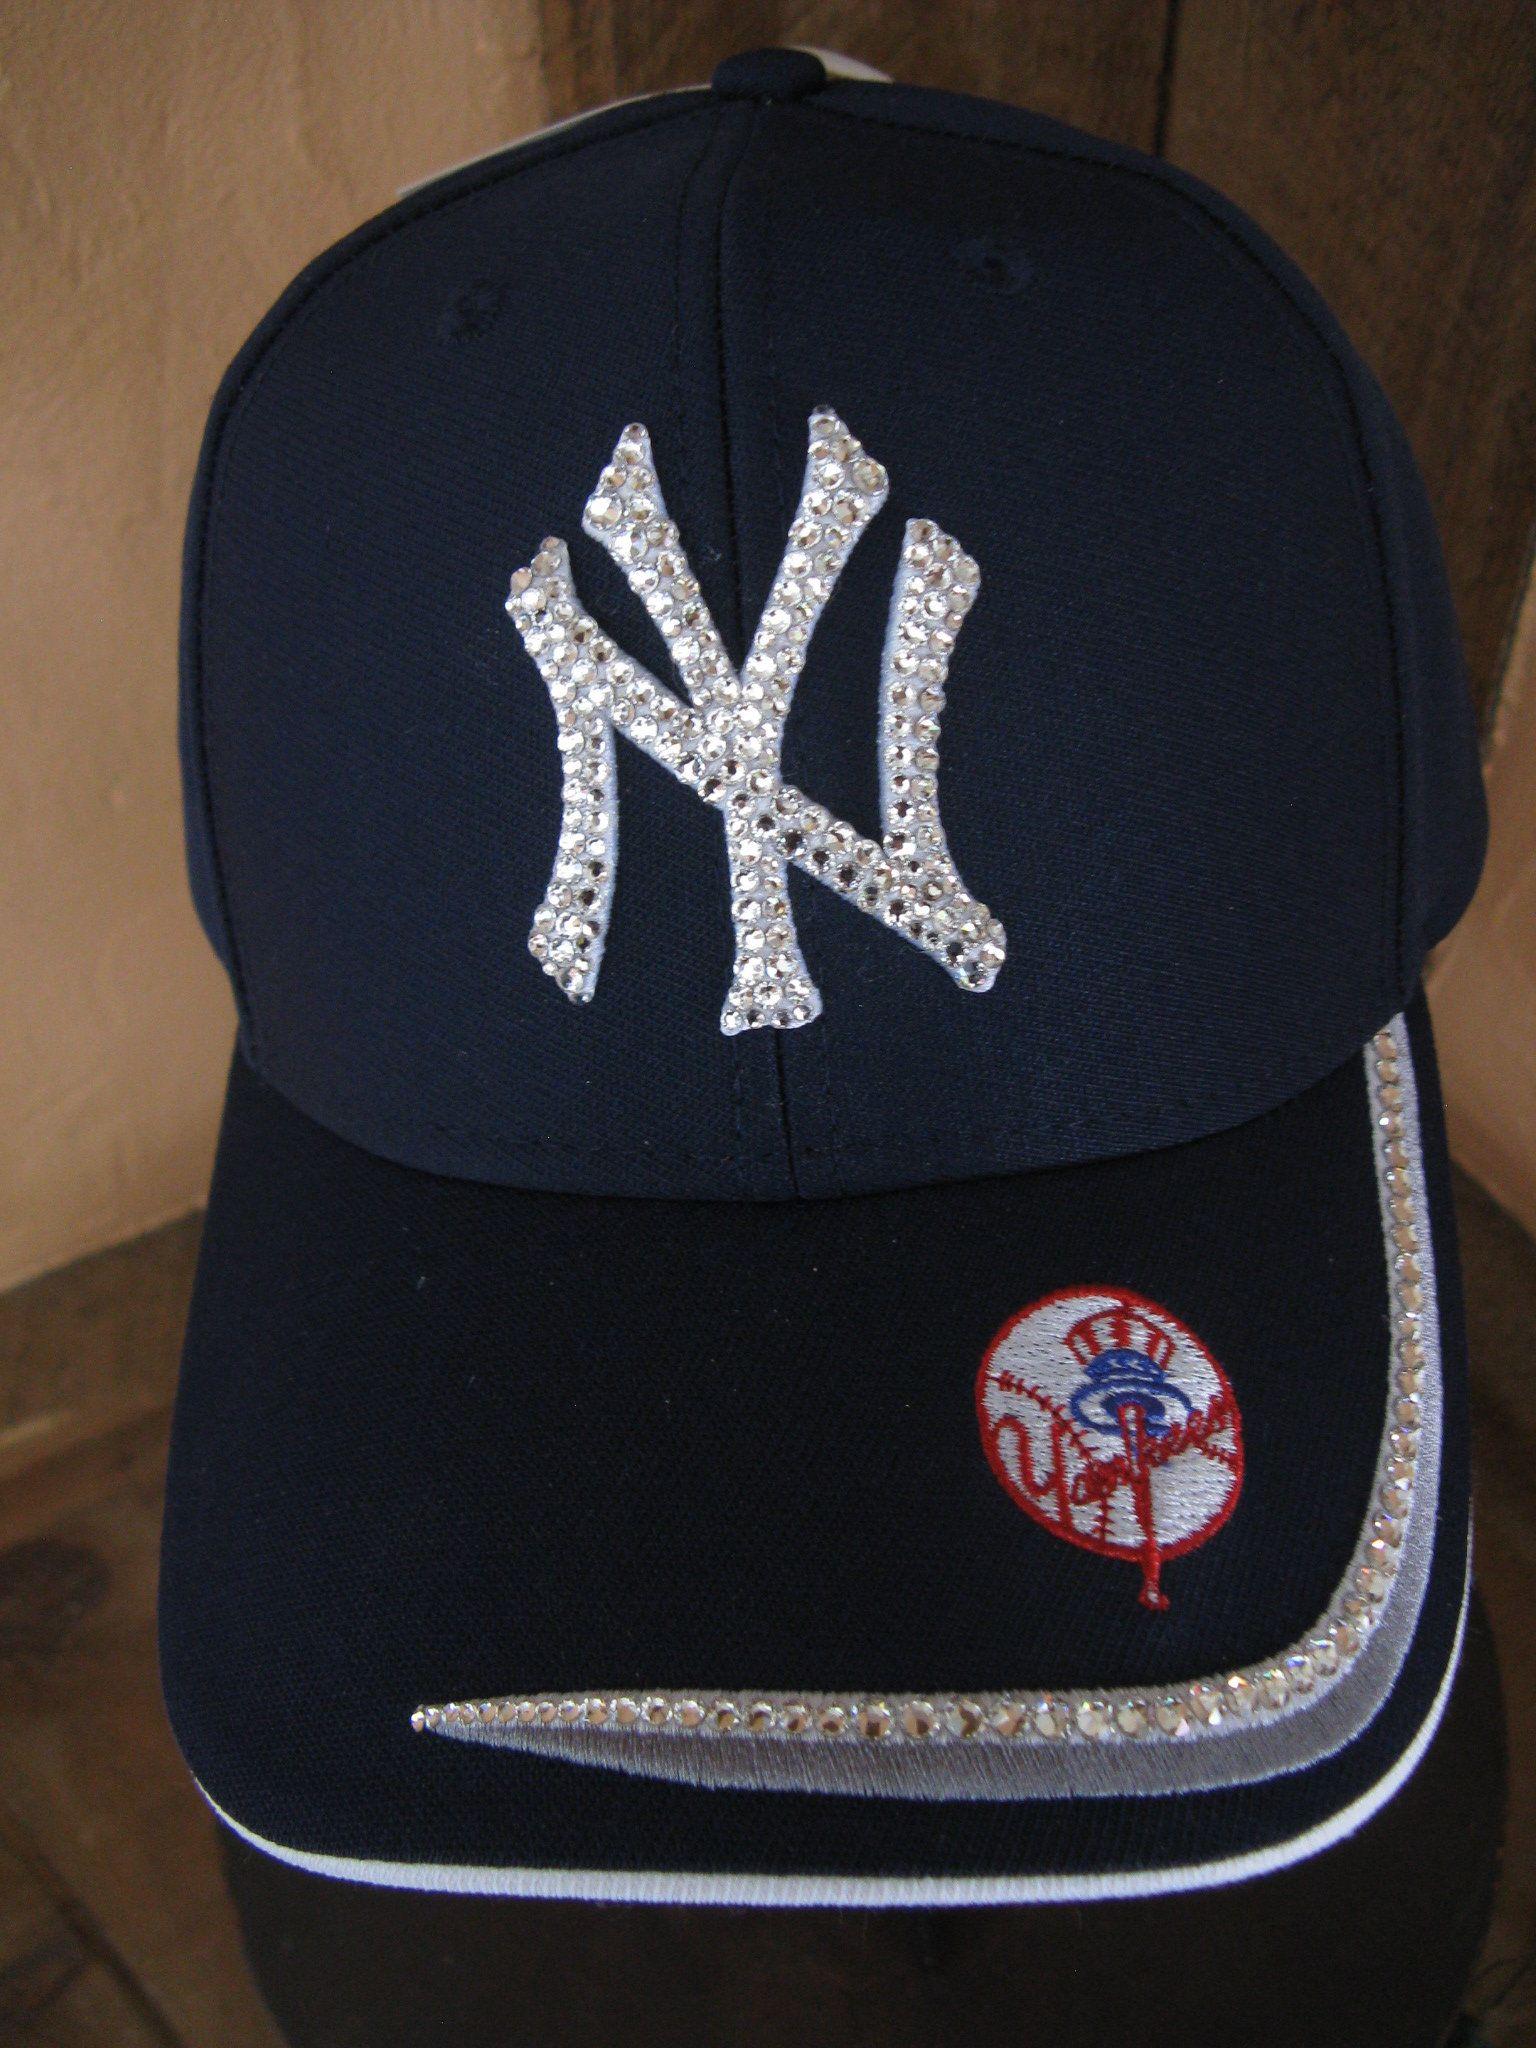 Swarovski Yankees Cap New York Baseball Hat Sports Sparkly Chic Navy Blue With Stripe Red Baseball And Bat Emblem By Loveywea Baseball Hats Reds Baseball Cap